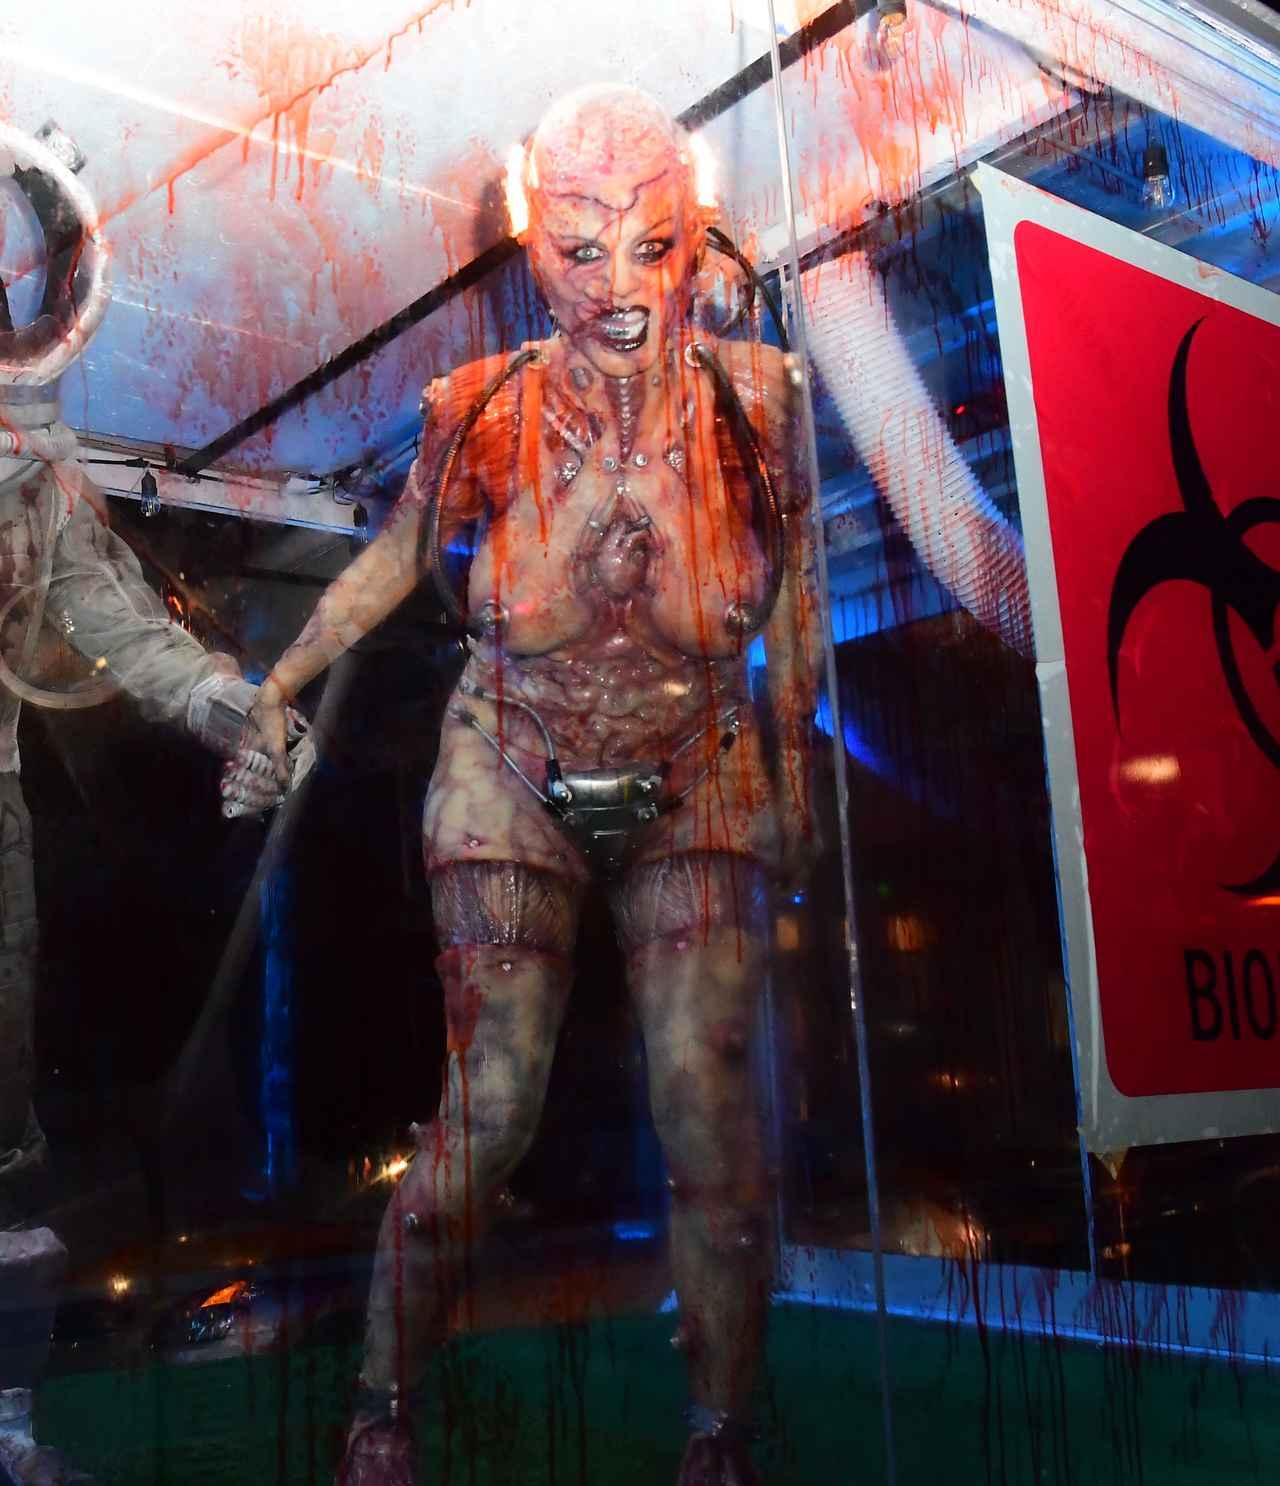 Images : 13番目の画像 - 「ハロウィンの女王」ハイディ・クルムの仮装が怖すぎる - フロントロウ -海外セレブ情報を発信